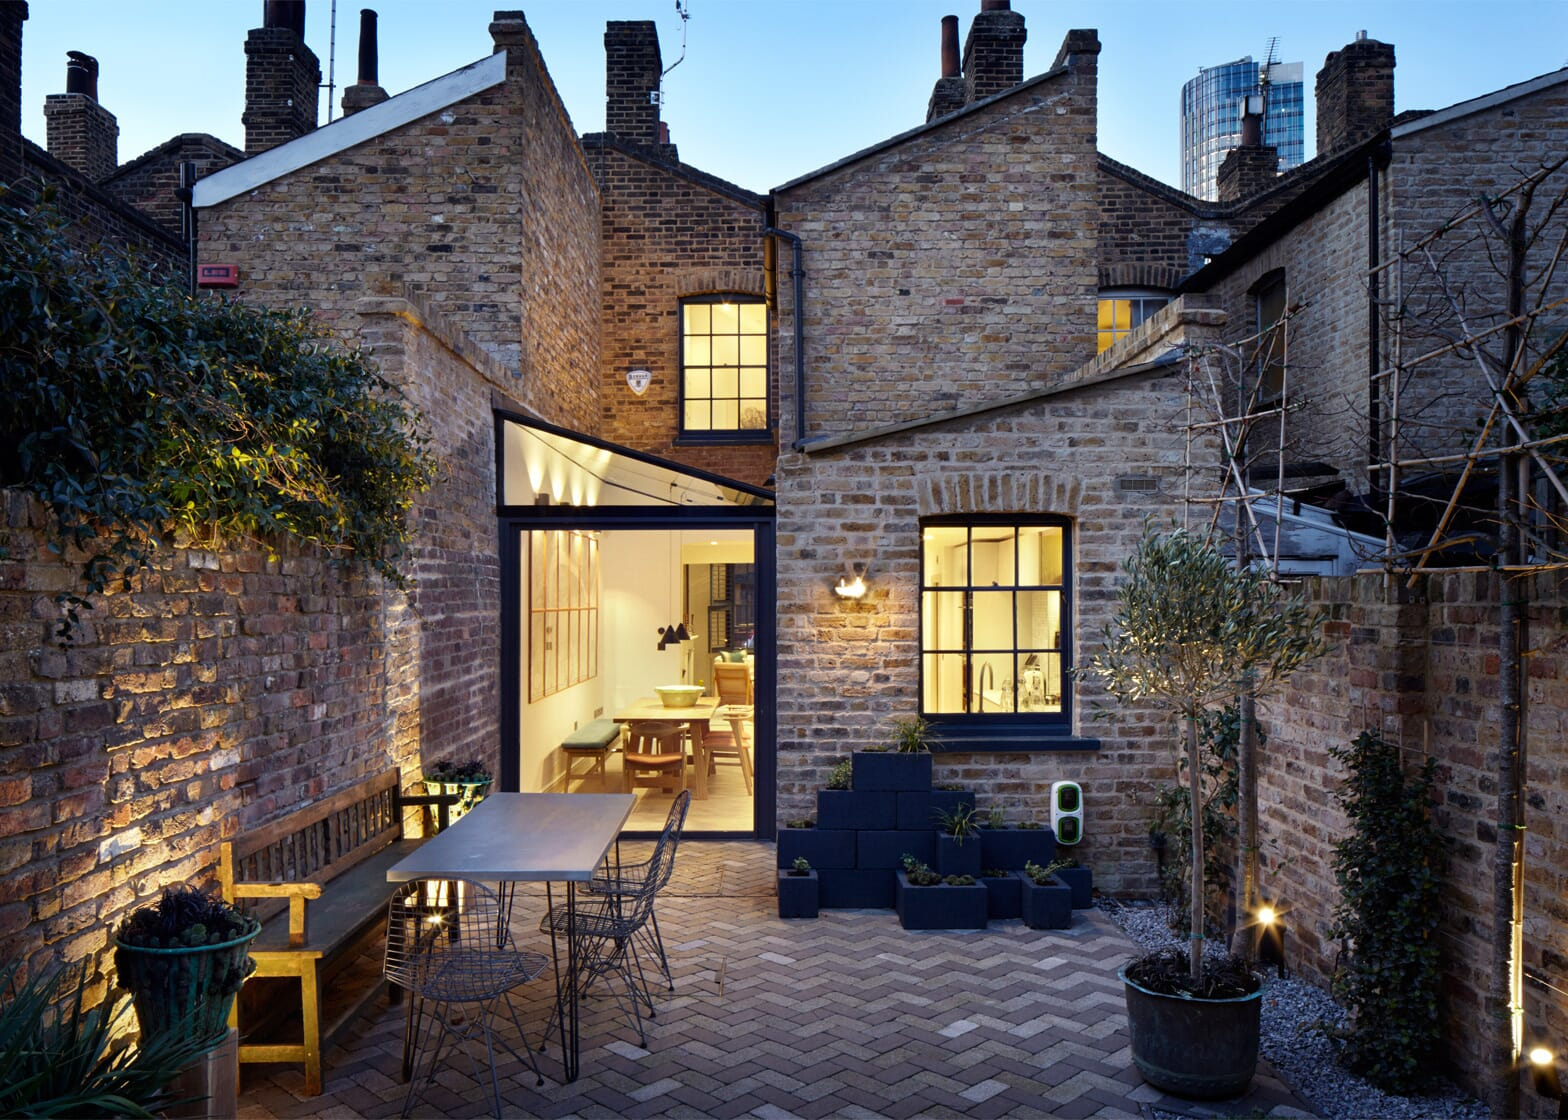 lambeth-marsh-house-fraher-architects-residential-renovation-london-uk_dezeen_1568_9-2